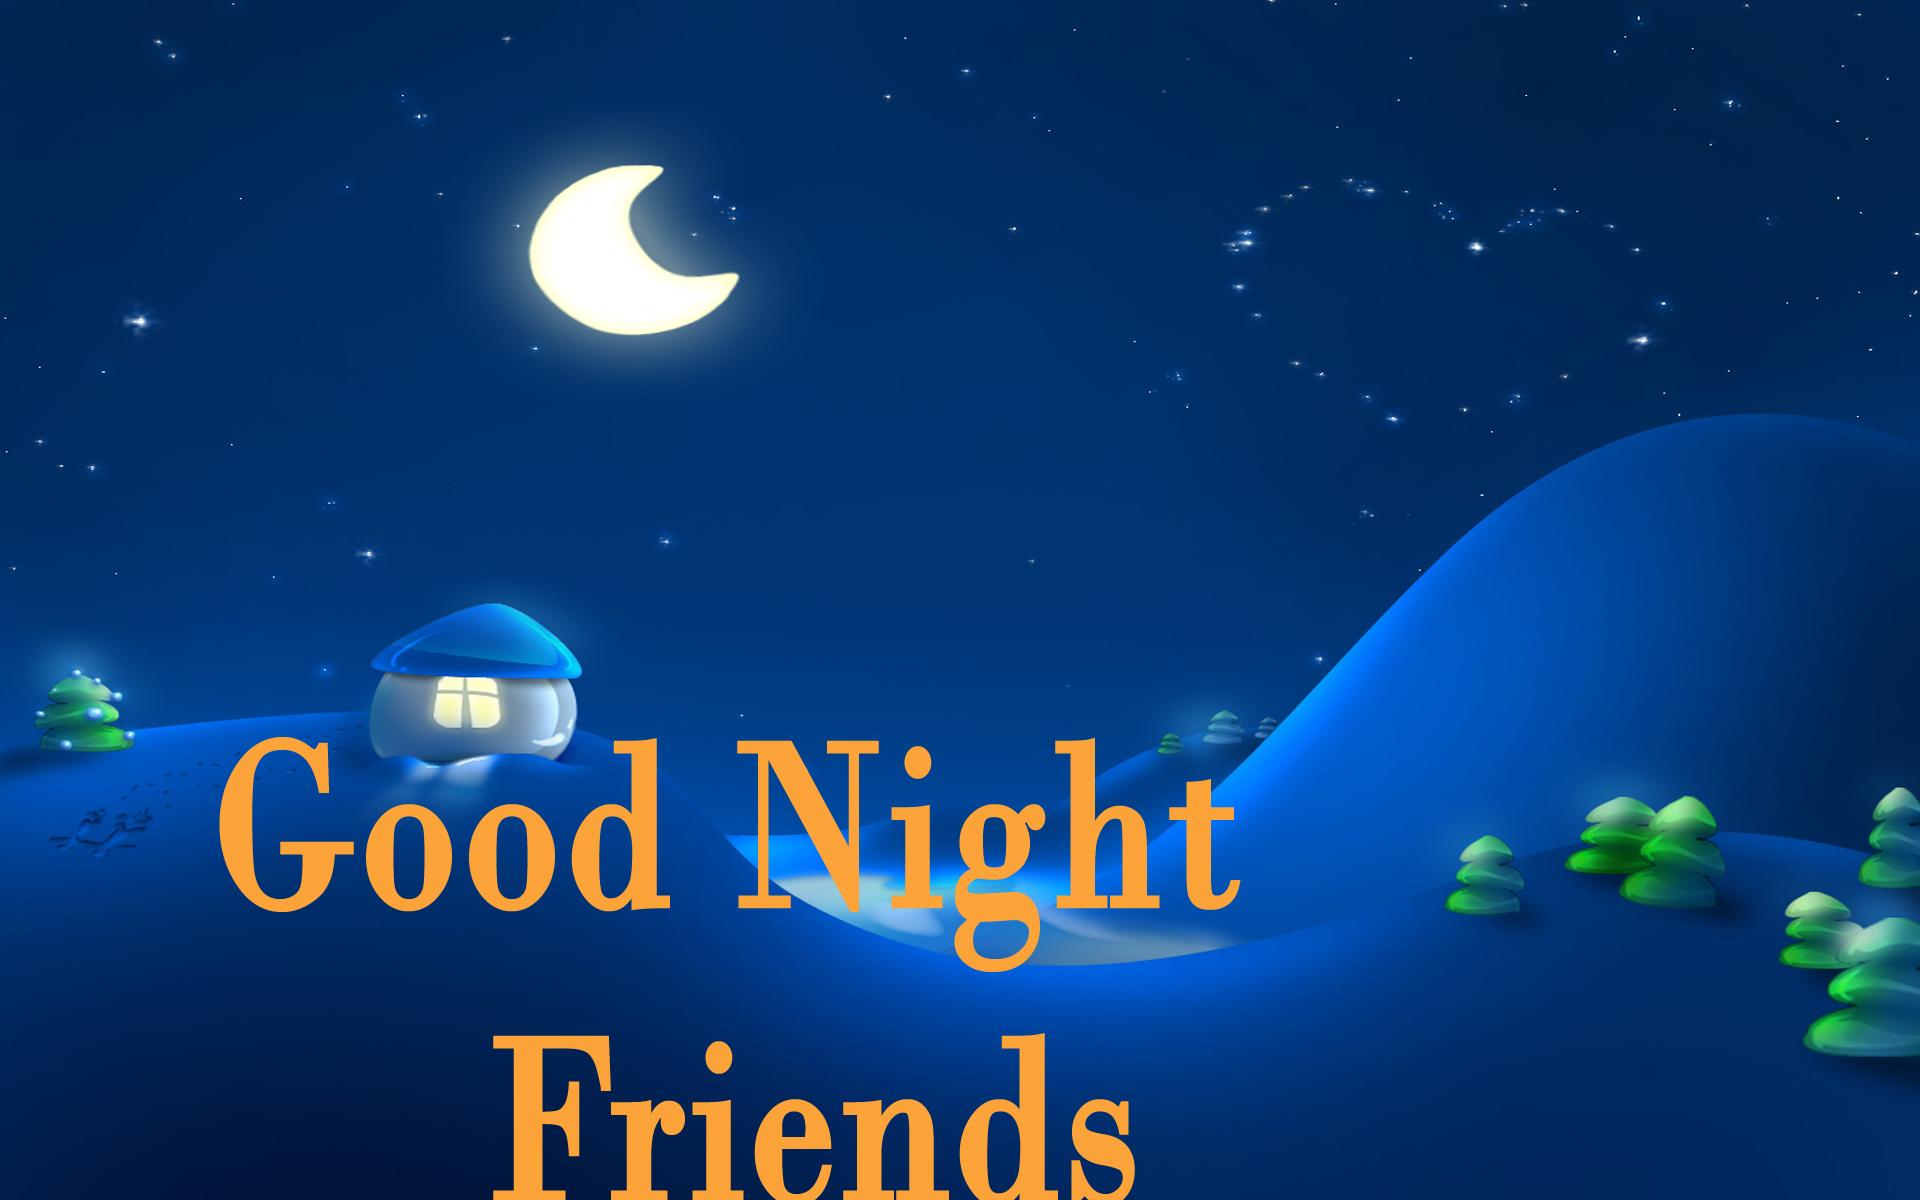 Pictures Of Good Night Friends Wallpaper Kidskunst Info